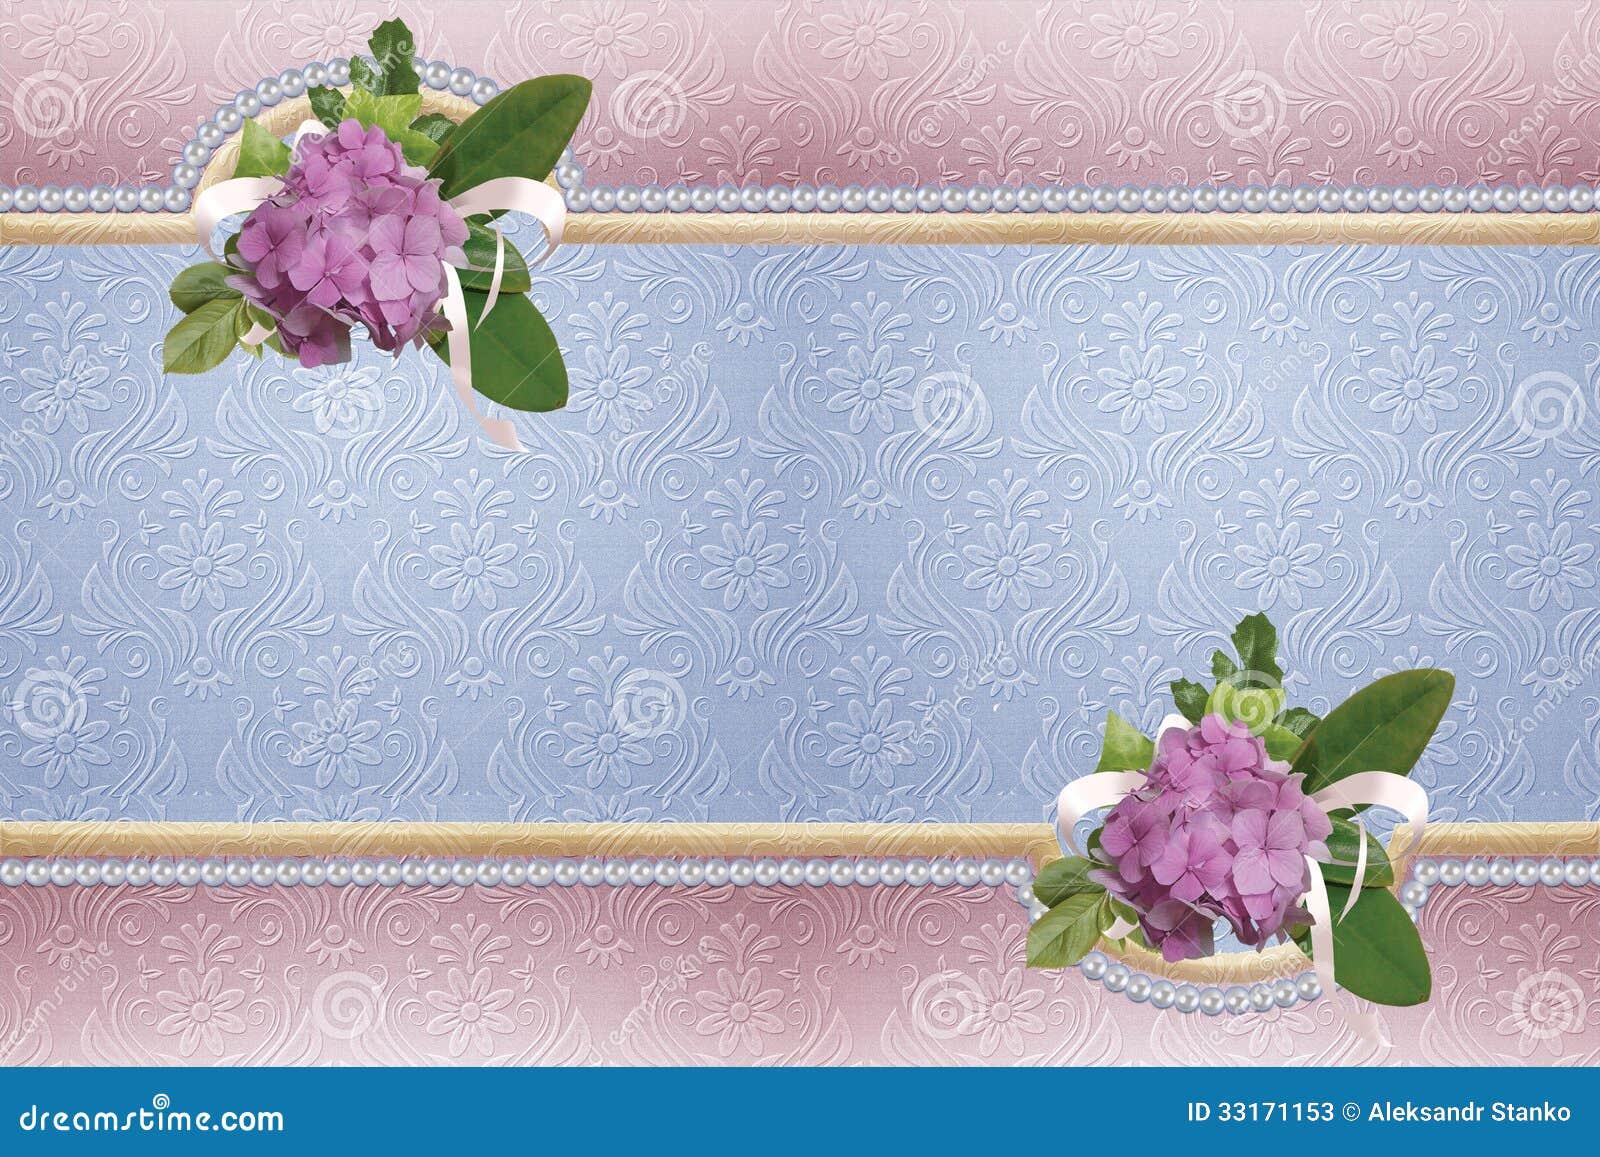 Elegant Wedding Backgrounds Stock Illustration - Illustration of